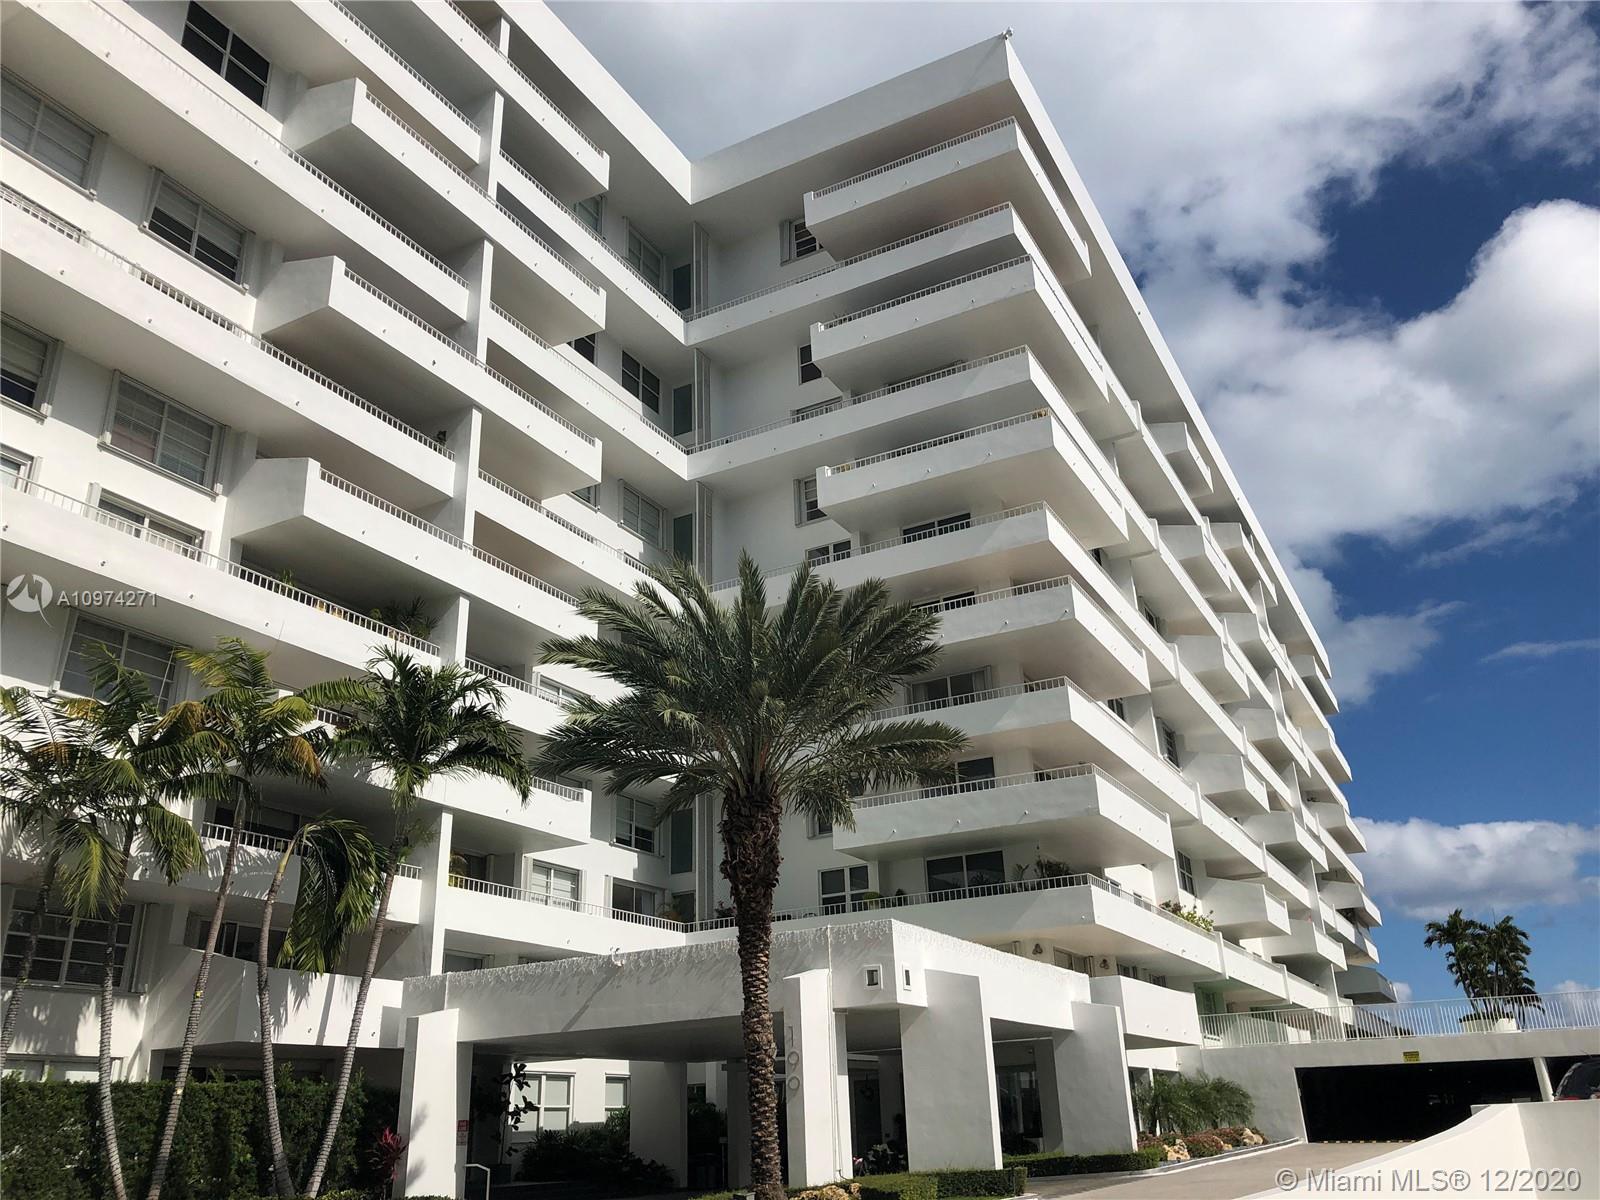 Commodore Club South #911 - 199 Ocean Lane Dr #911, Key Biscayne, FL 33149